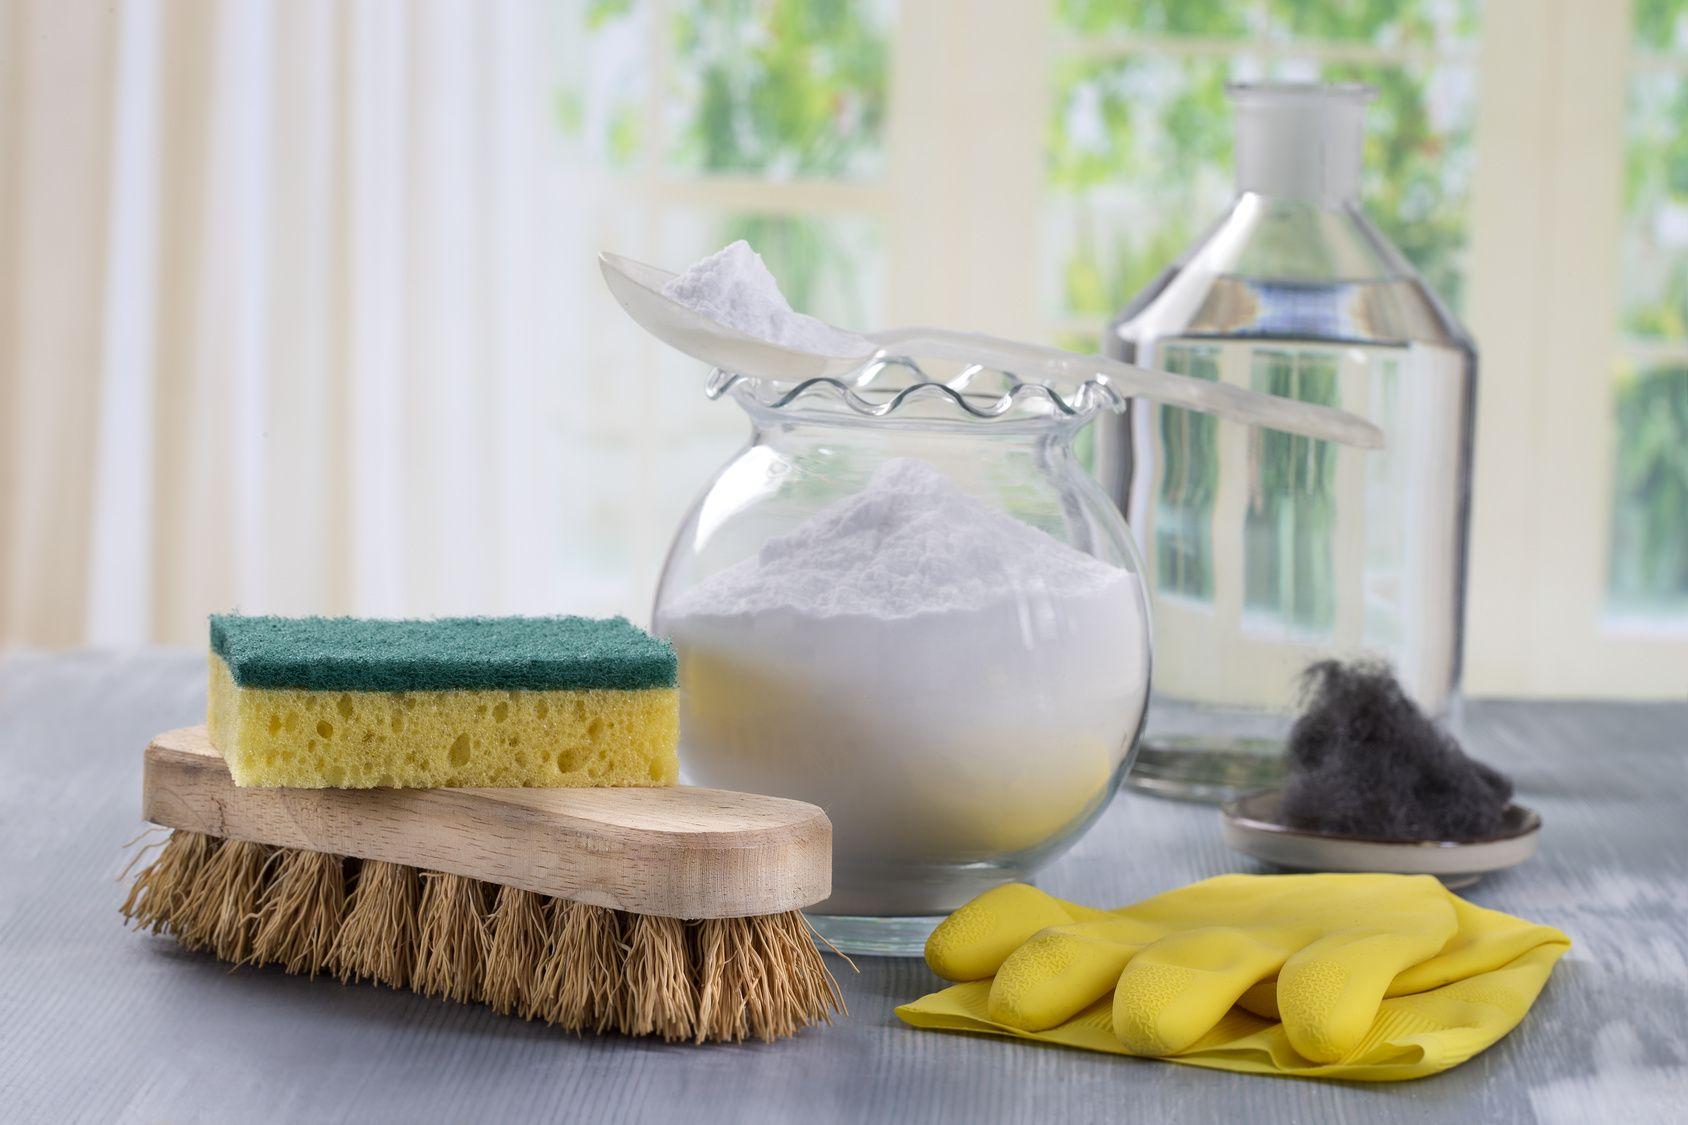 le ménage au naturel, formation, bien vivre, blog